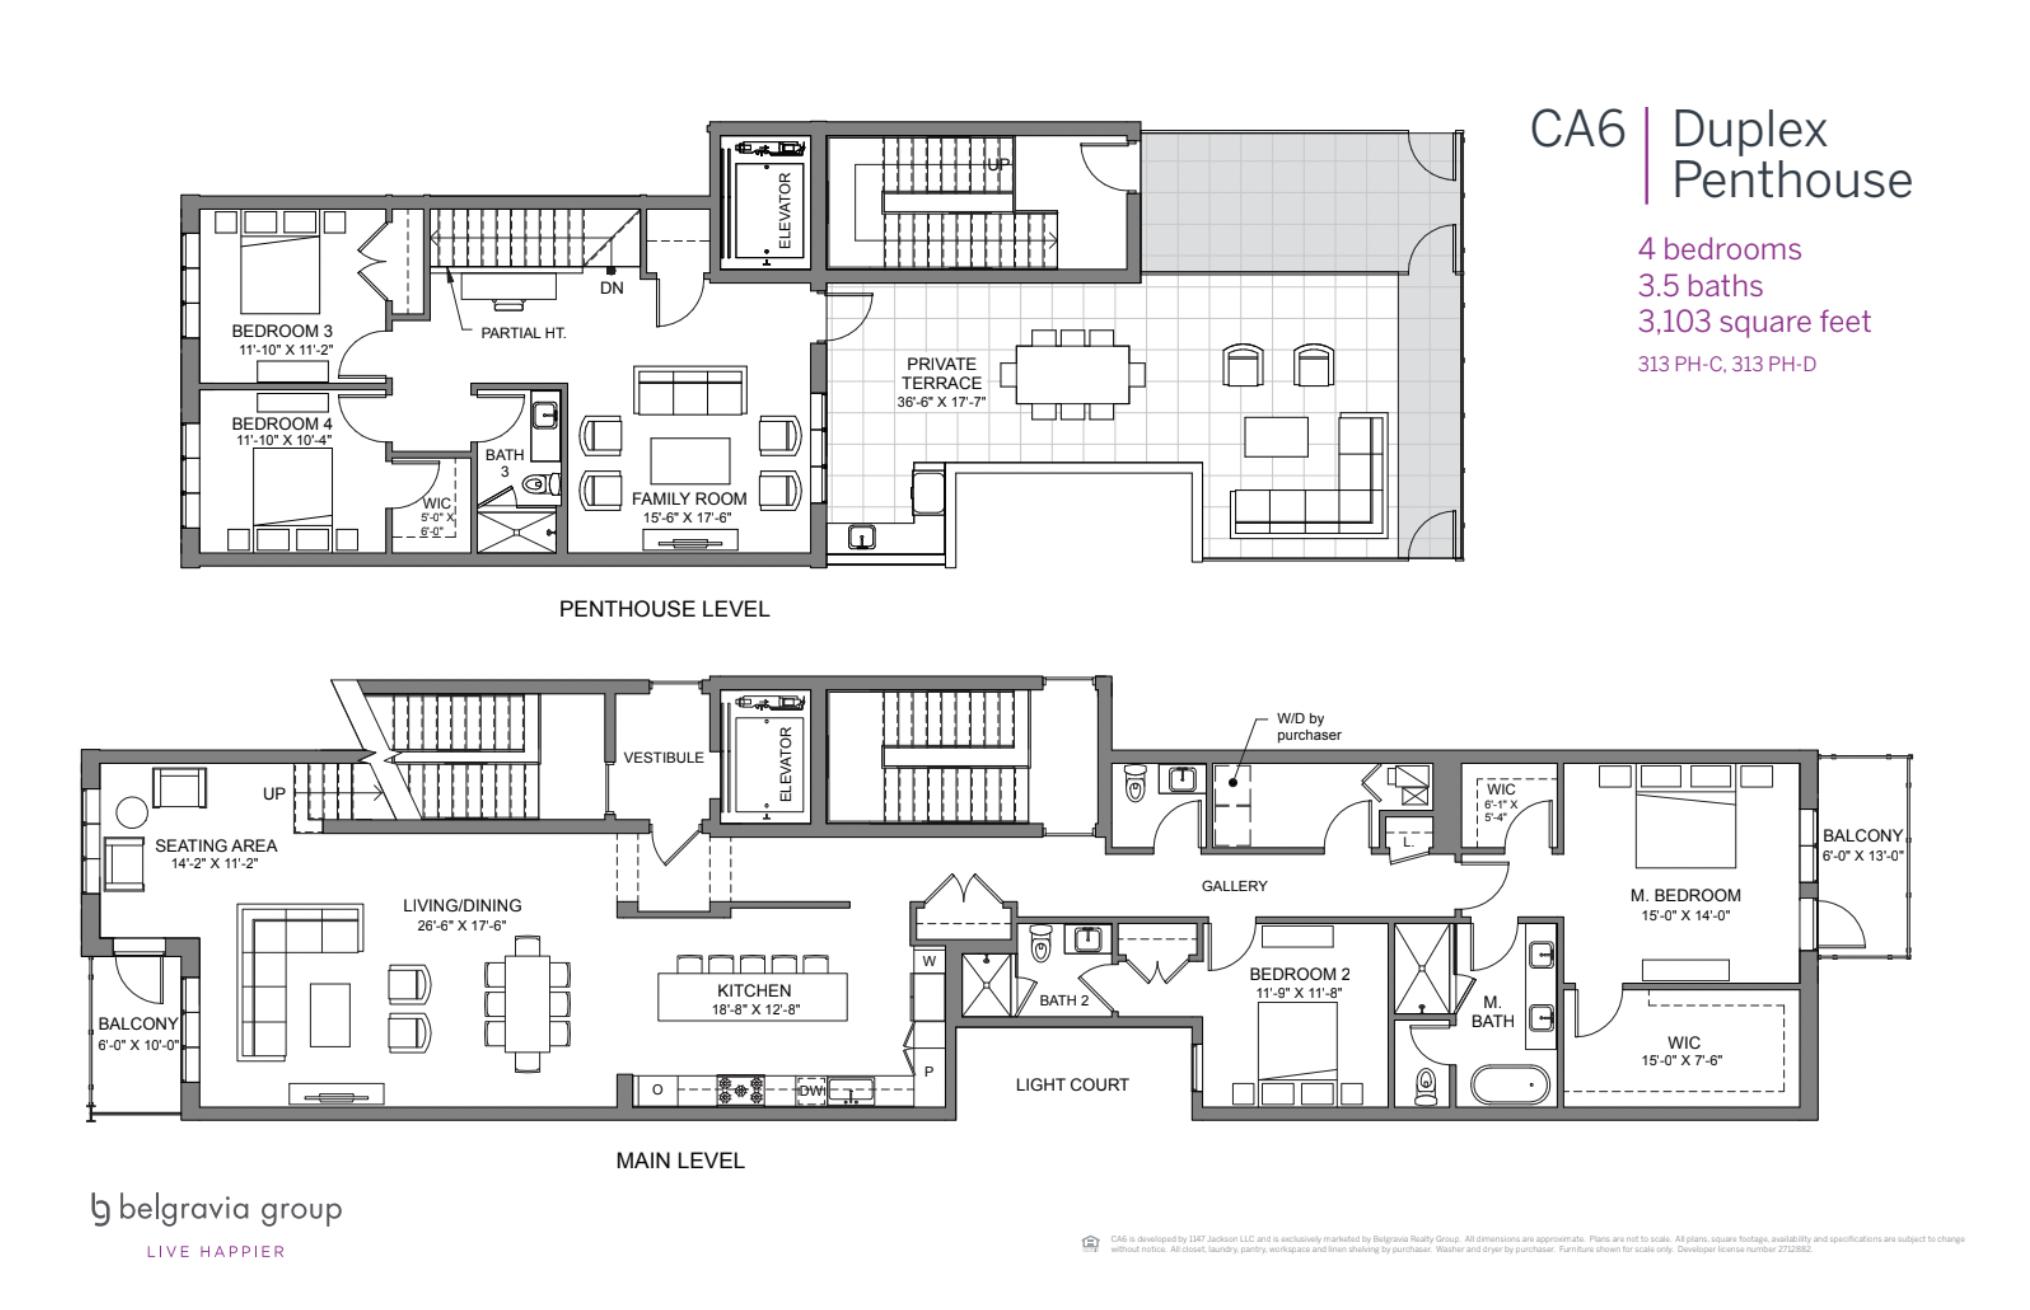 CA6 Condominiums Duplex Penthouse plan (2 of 2)